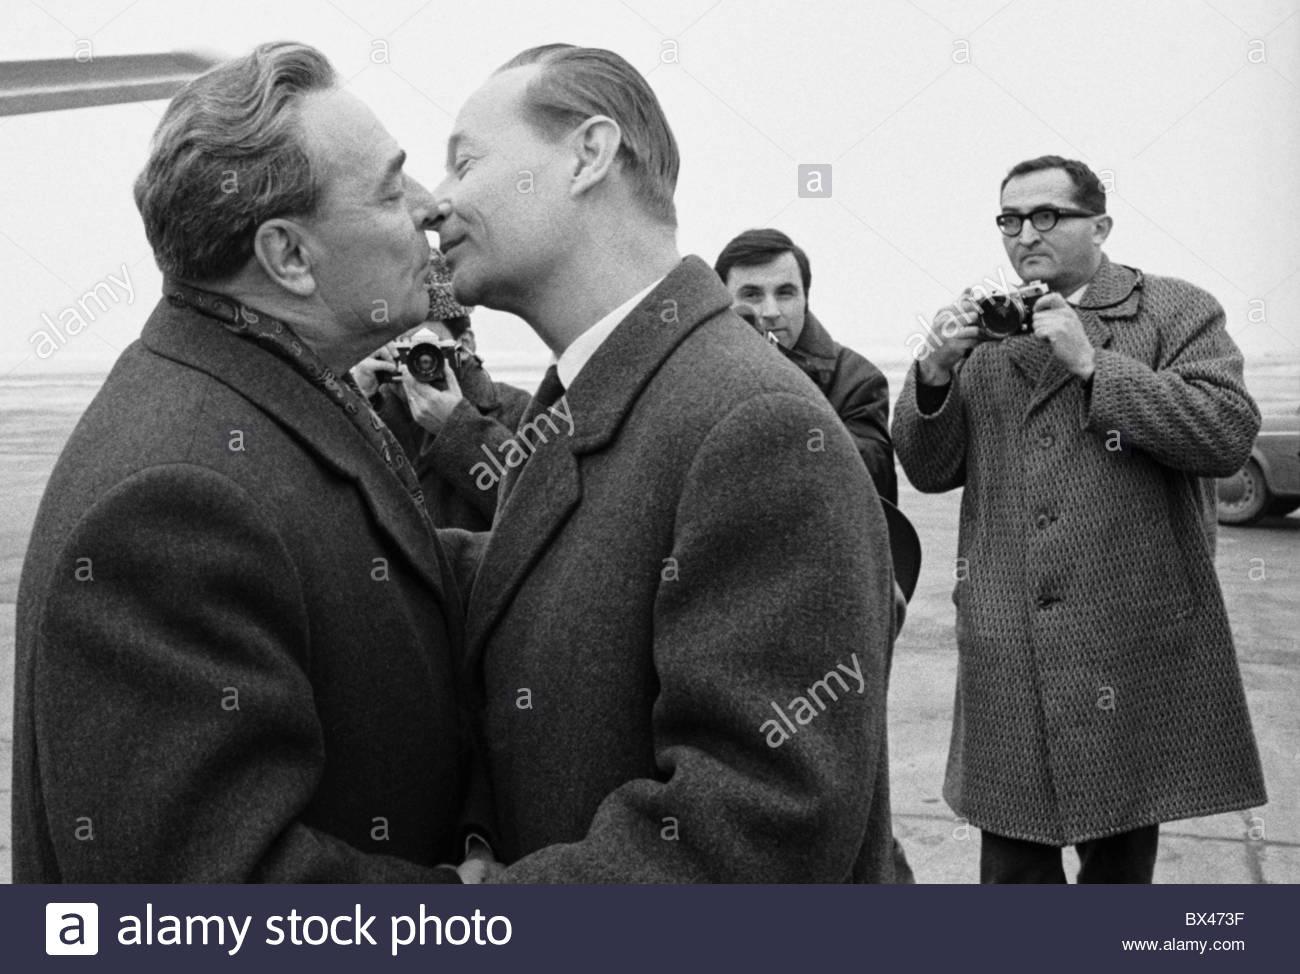 6.  20.  1000.   The Soviet Invasion of Czechoslovakia-alexander-dubcek-leonid-brezhnev-kiss-bx473f